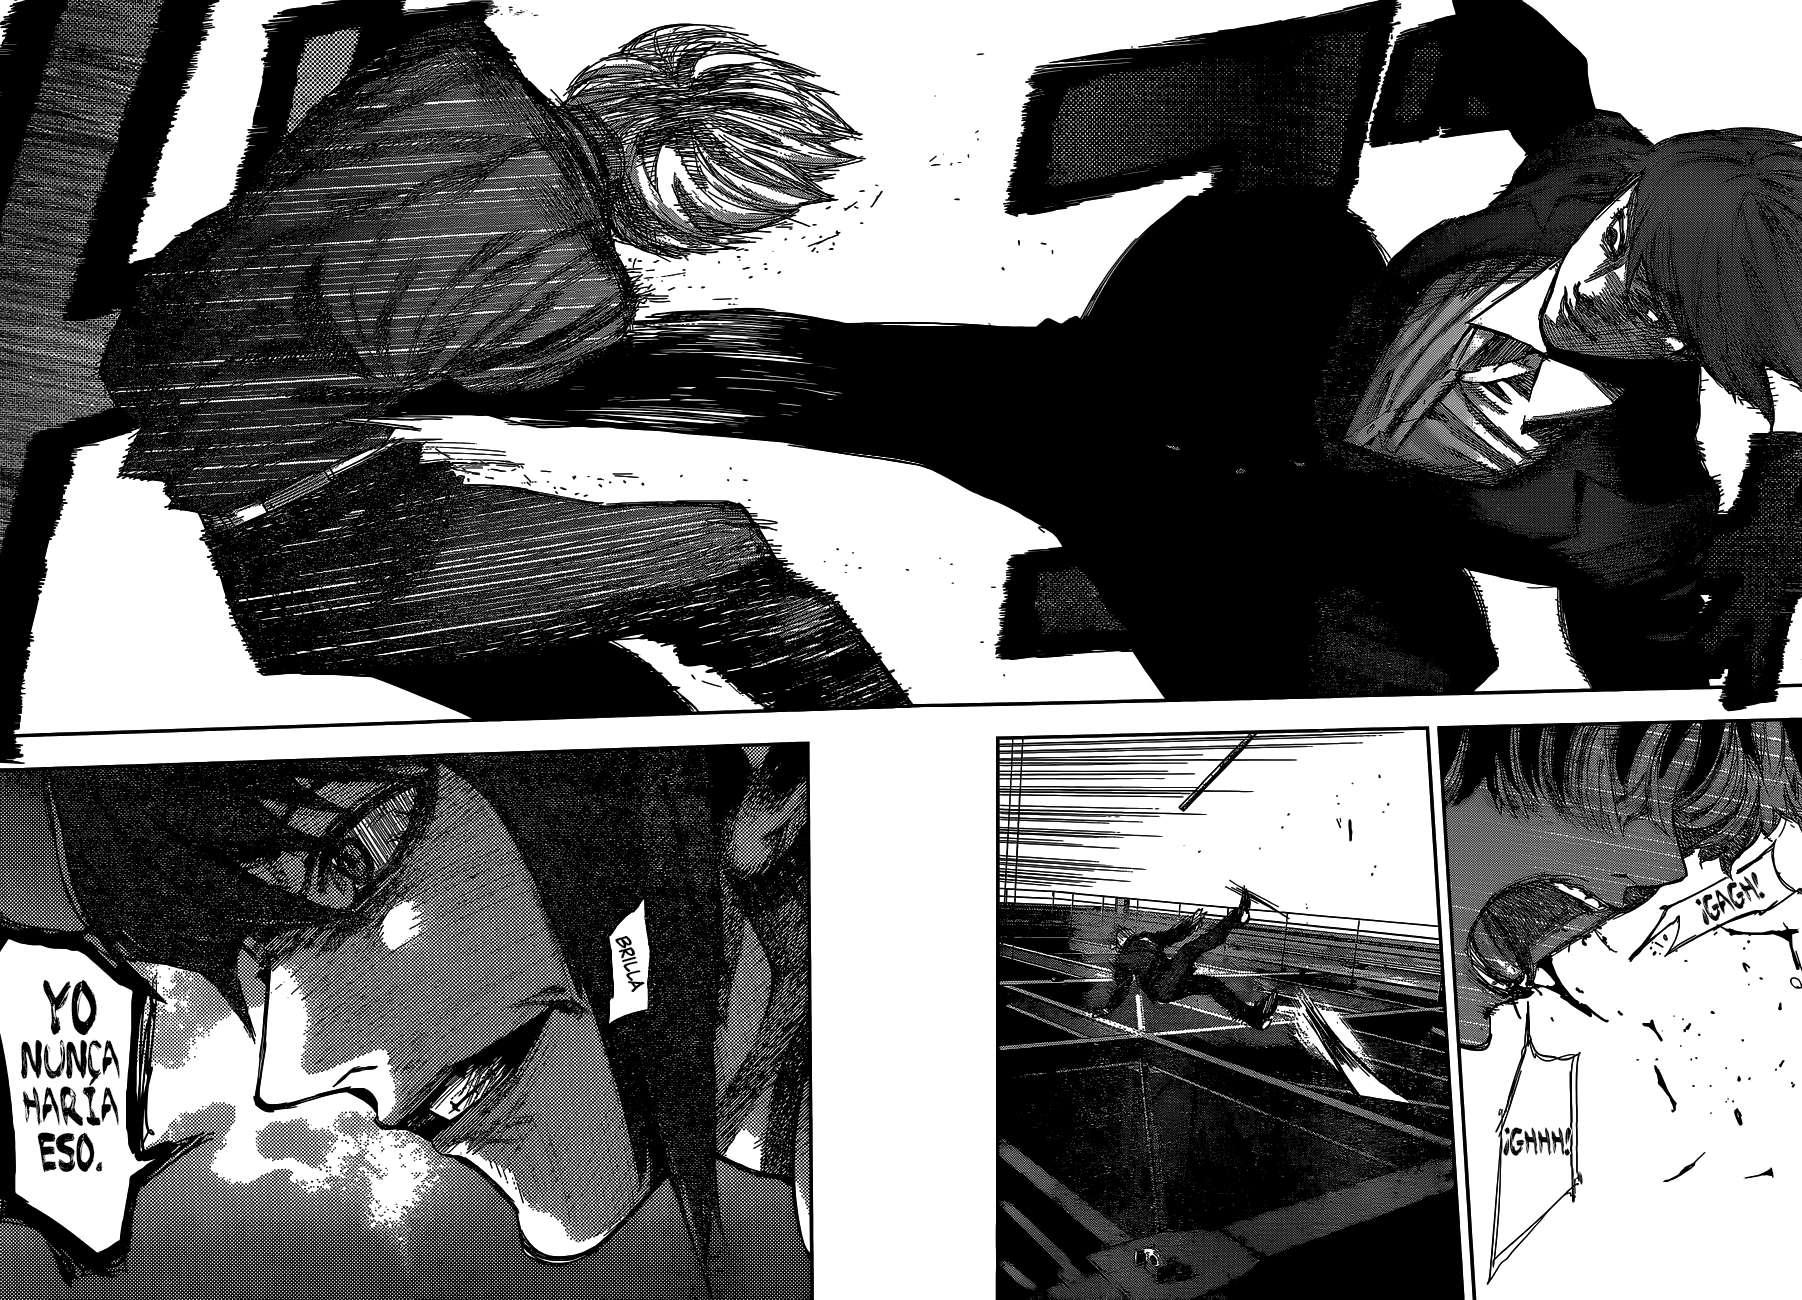 http://c5.ninemanga.com/es_manga/59/59/419347/dc9fa5f217a1e57b8a6adeb065560b38.jpg Page 6